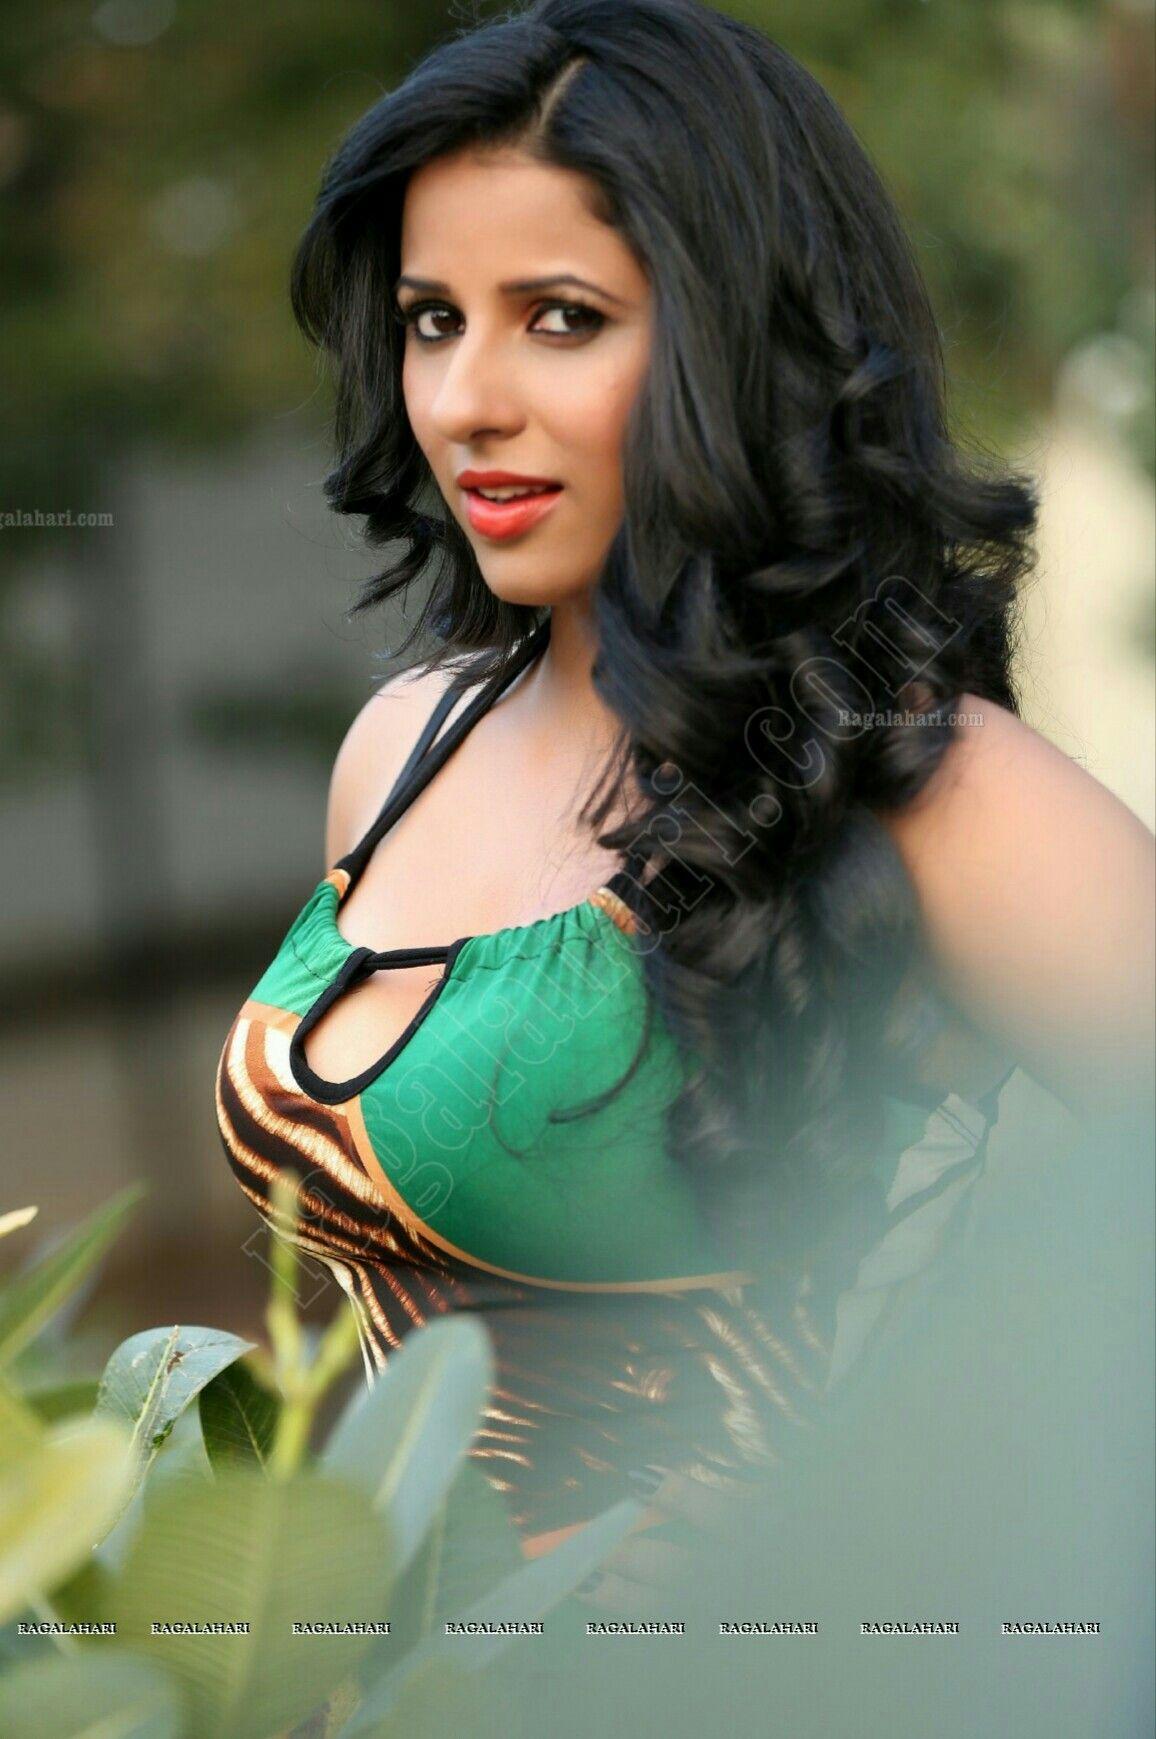 Shravya Reddy   Telugu Actress and Anchor - YouTube